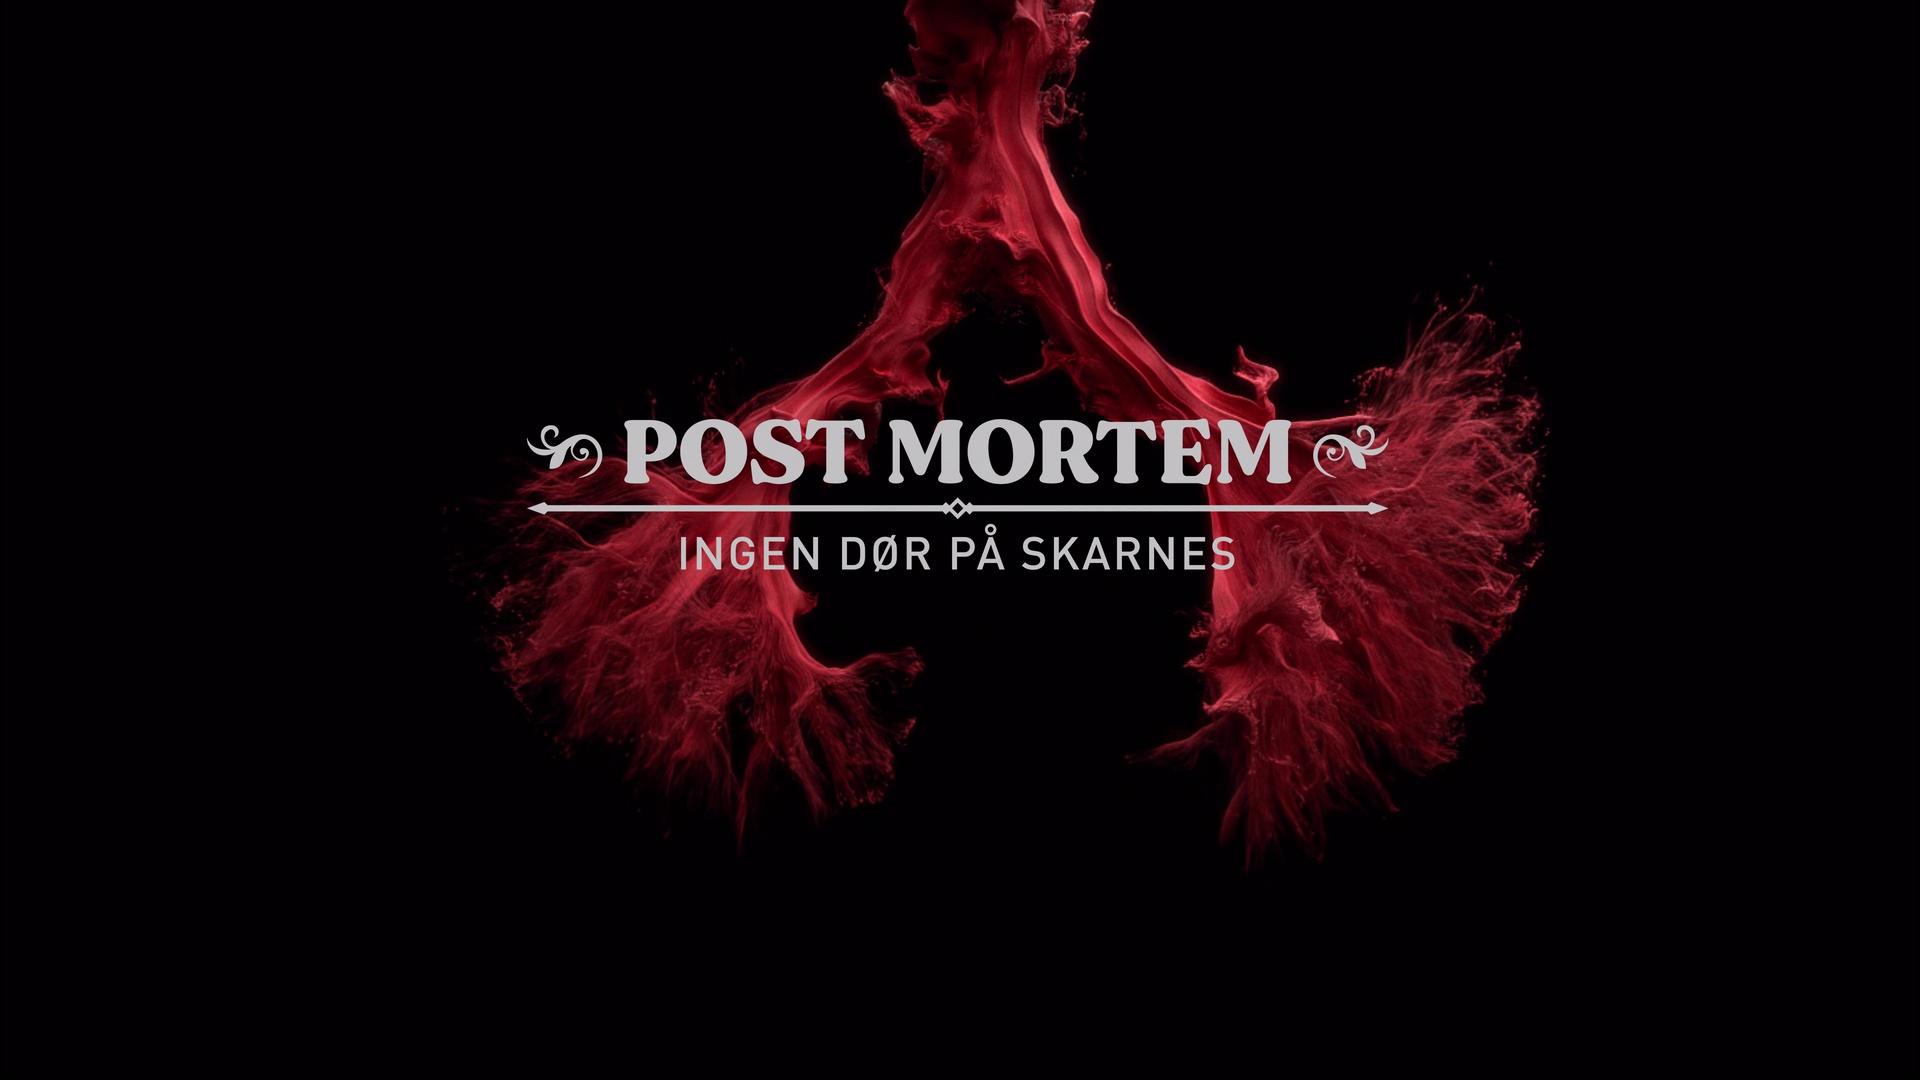 Post mortem: Nadie muere en Skarnes (2021) Temporada 1 1080p WEB-DL Latino